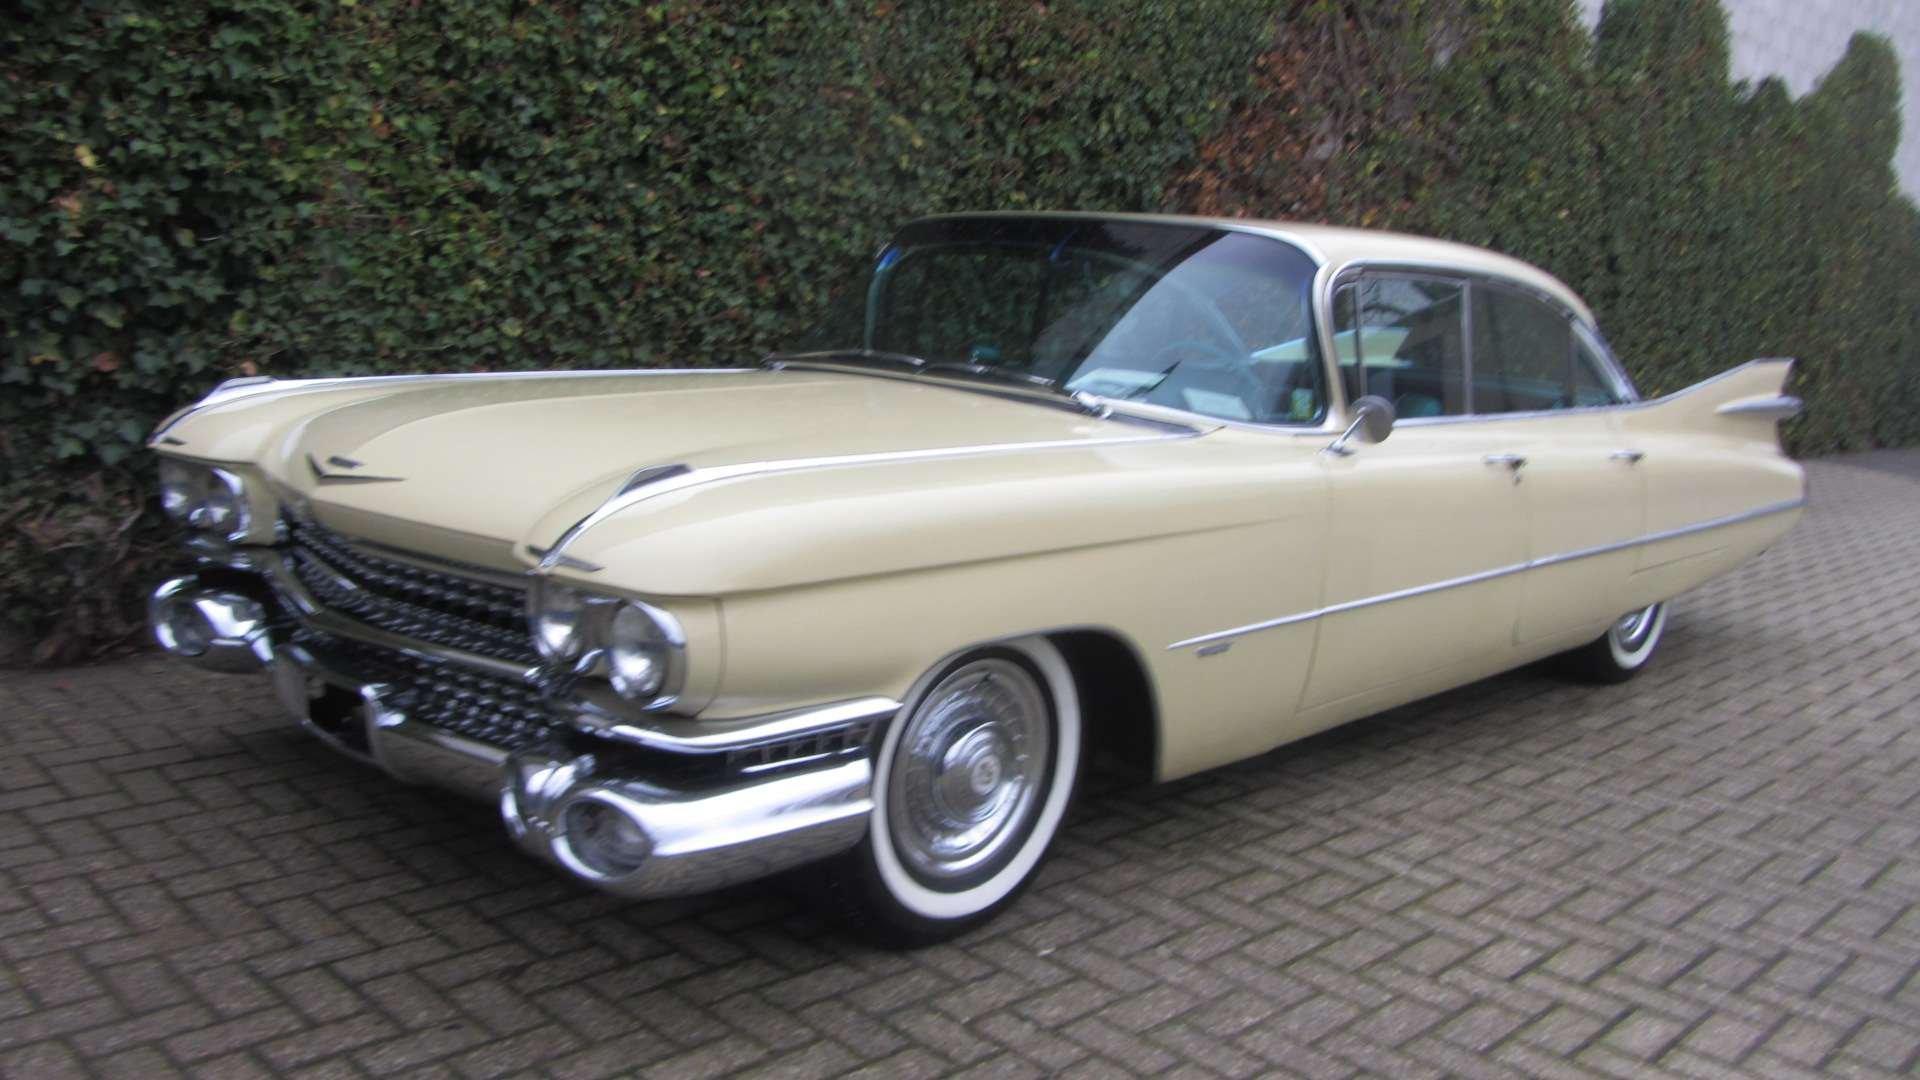 Cadillac Sedan de Ville 1959 & 50 USA Classics For Sale (picture 4 of 6)